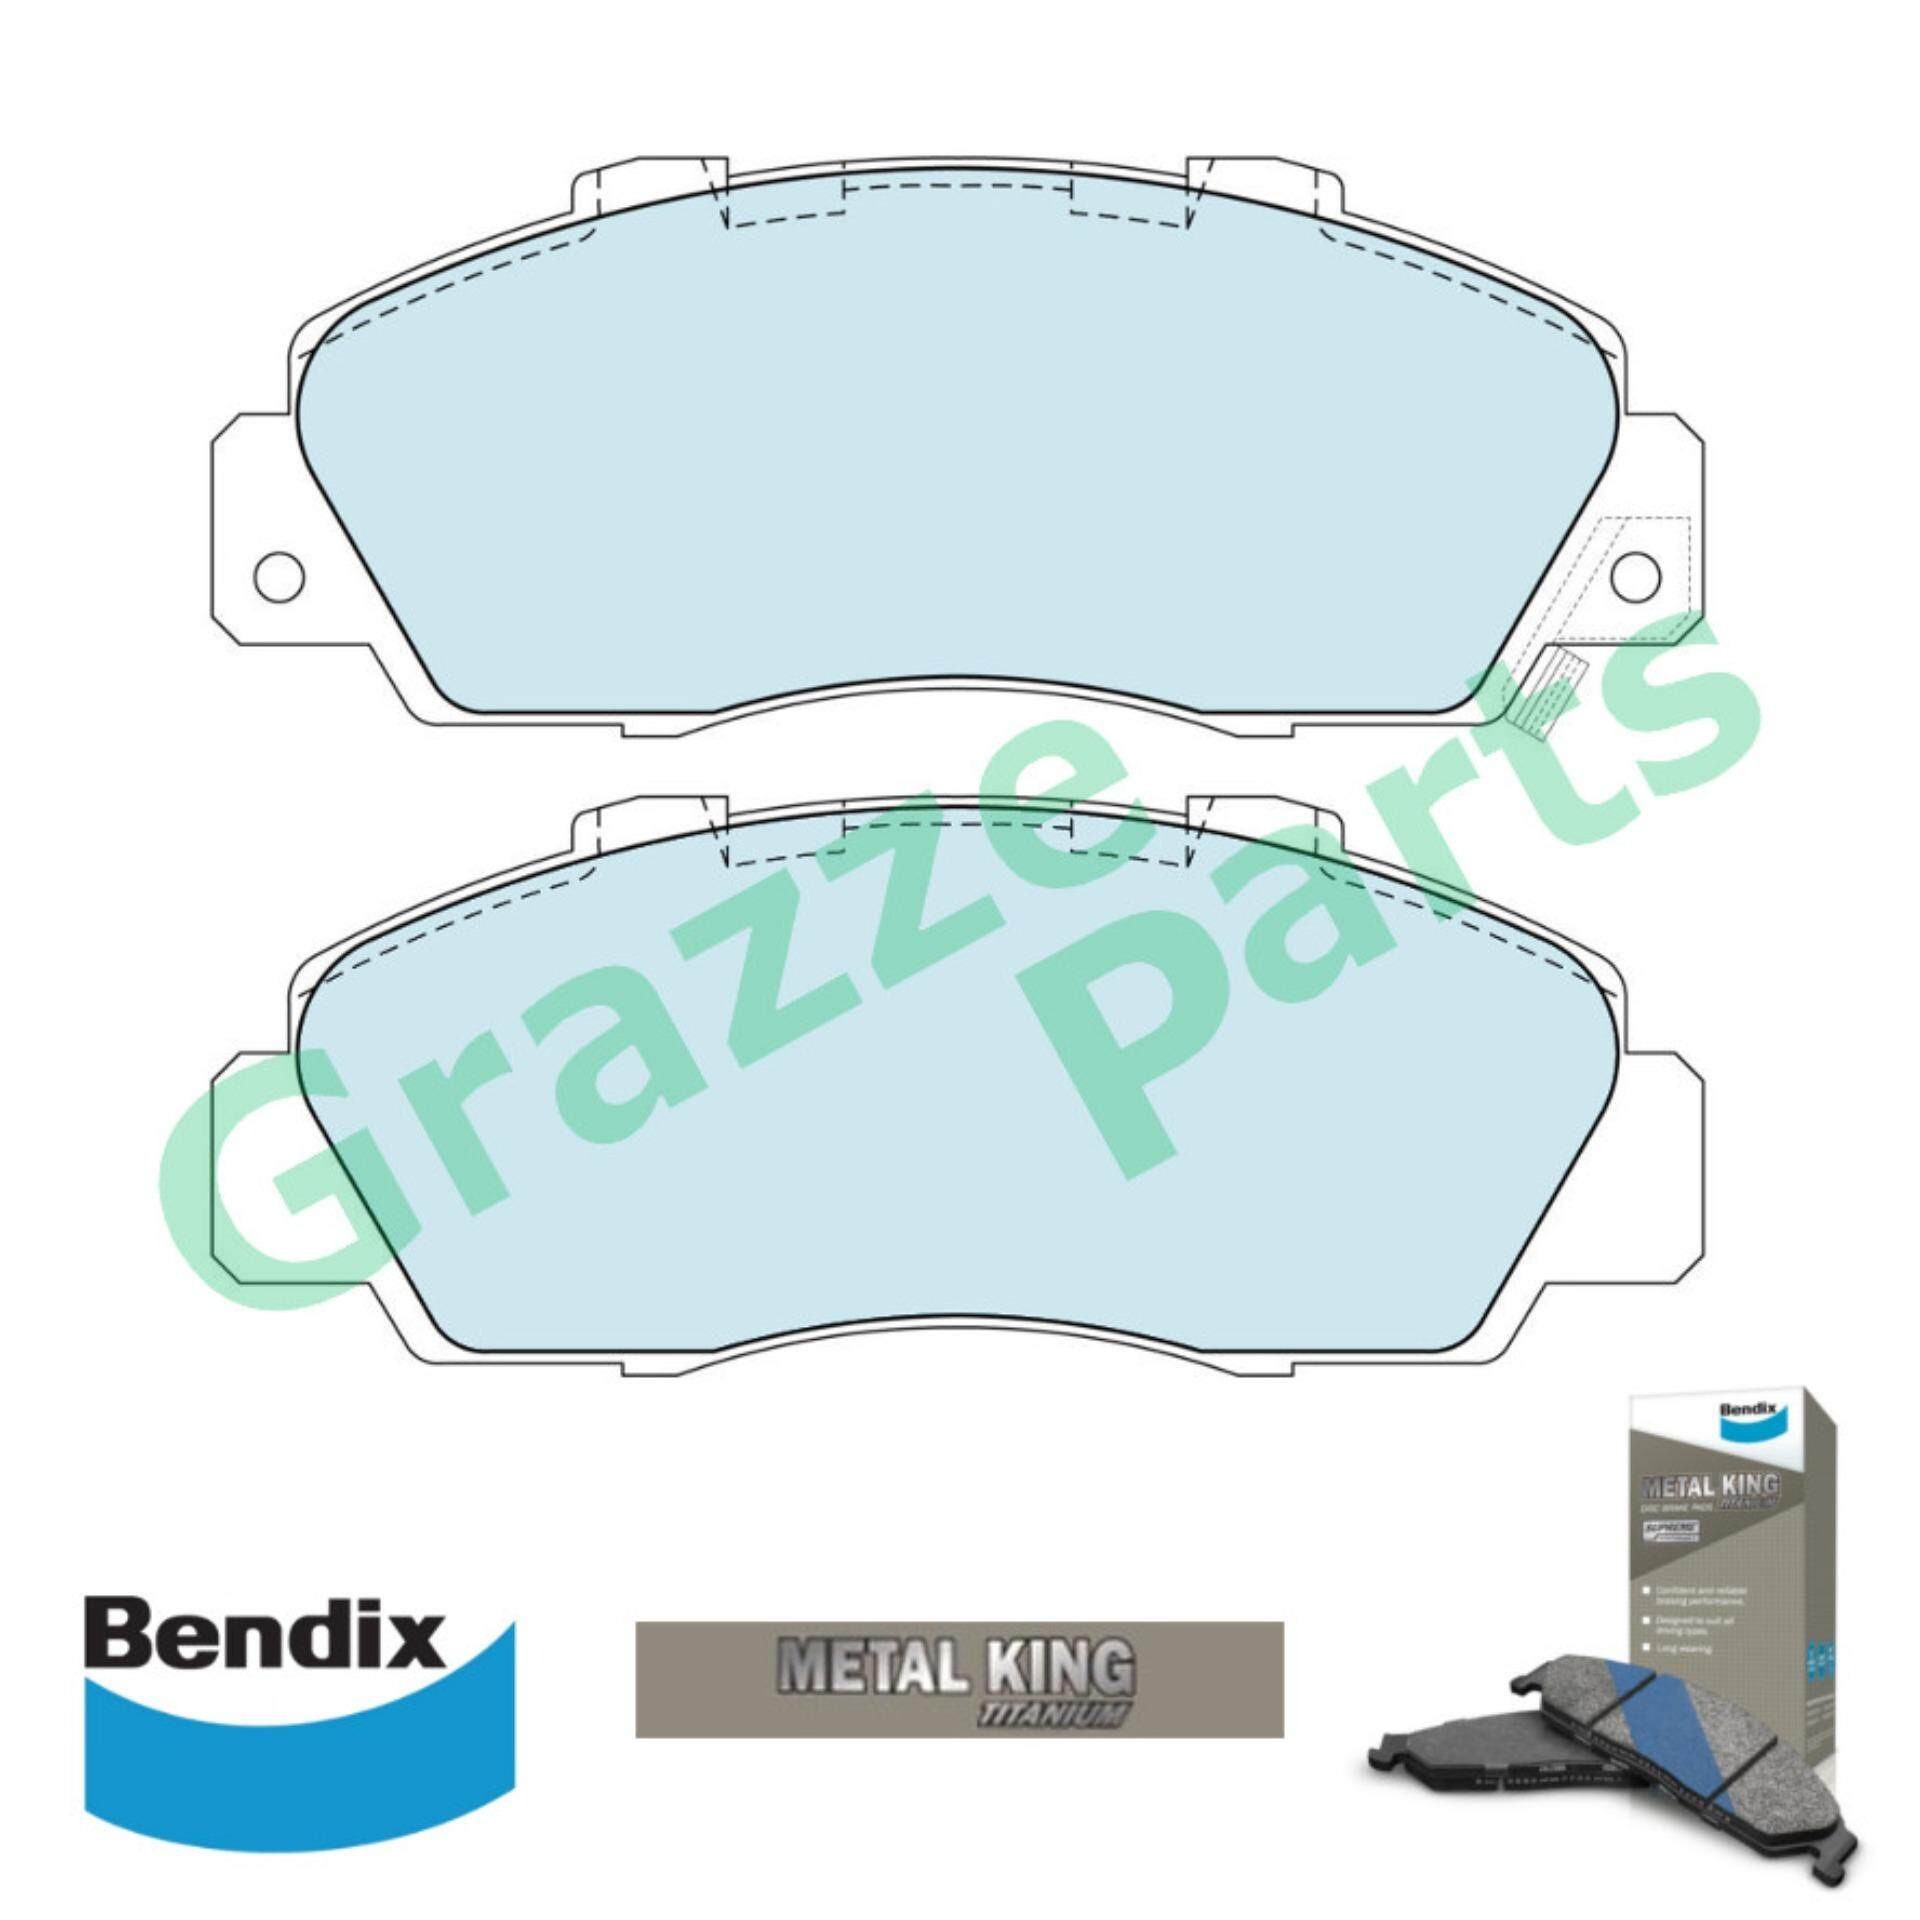 Bendix Metal King Titanium Disc Brake Pad Front for DB1206 - Honda Accord SV4 NSX Prelude SSO Odyssey Legend Integra